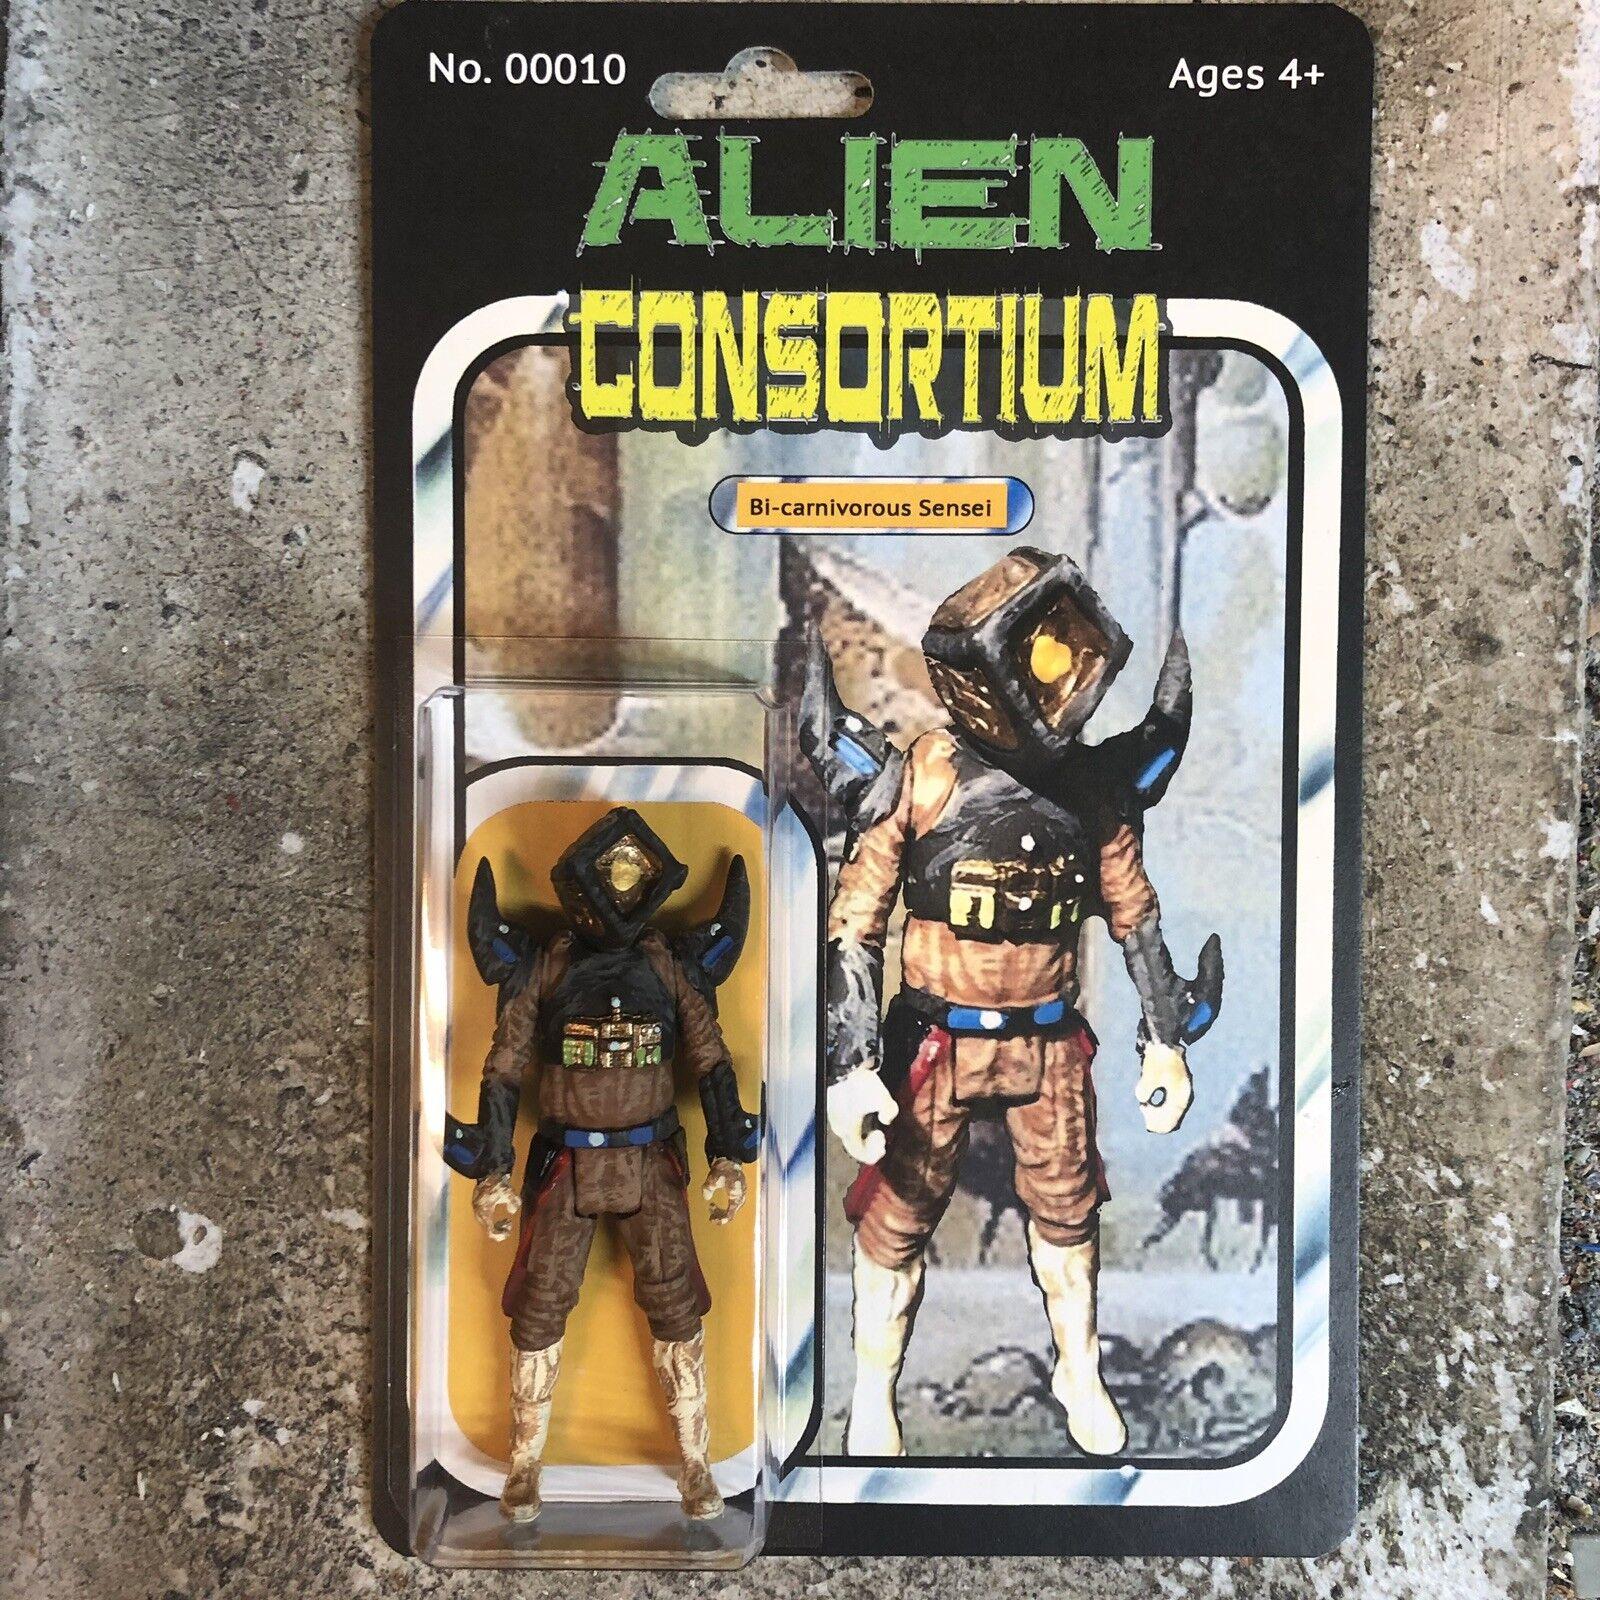 "Alien Consortium Bi-carnivgoldus Sensei 3.75"" Action Figure Figure Figure Star Force Alien Wars e009cf"